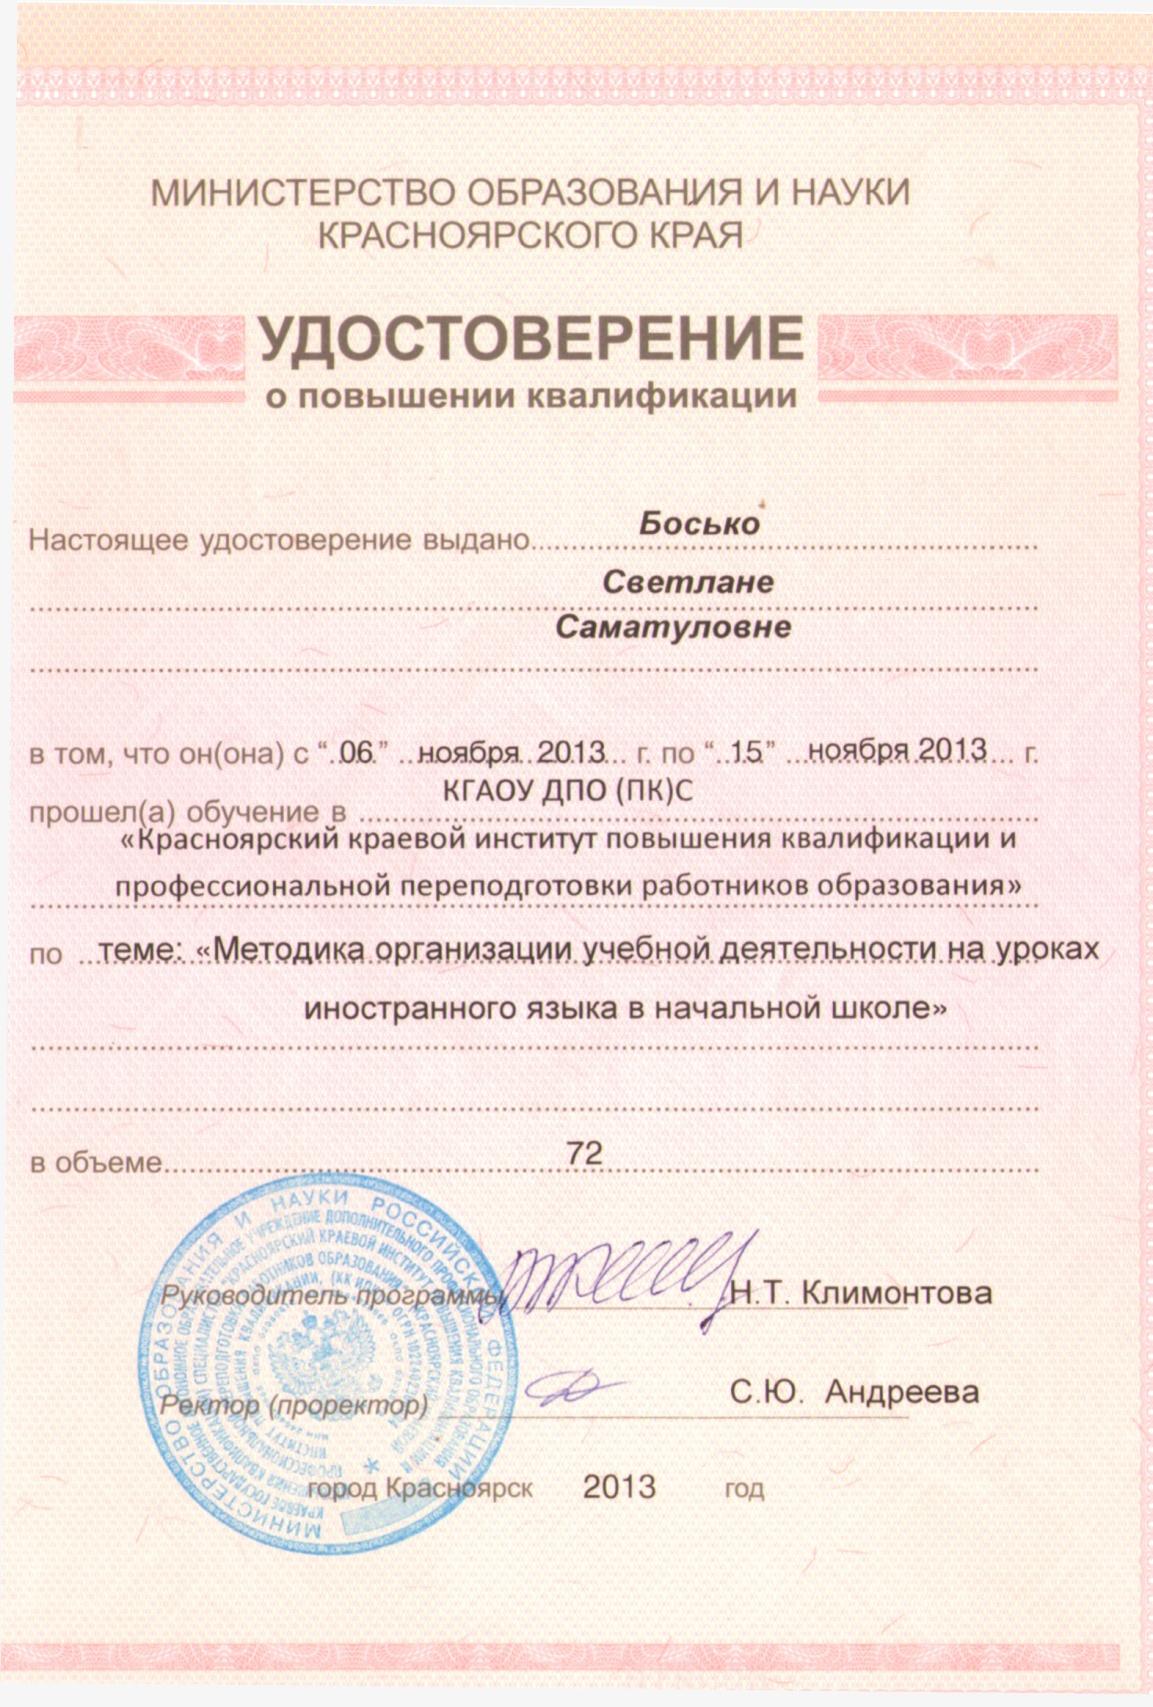 C:\Documents and Settings\Светлана Саматуловна\Рабочий стол\квалификация\13 20001.tif